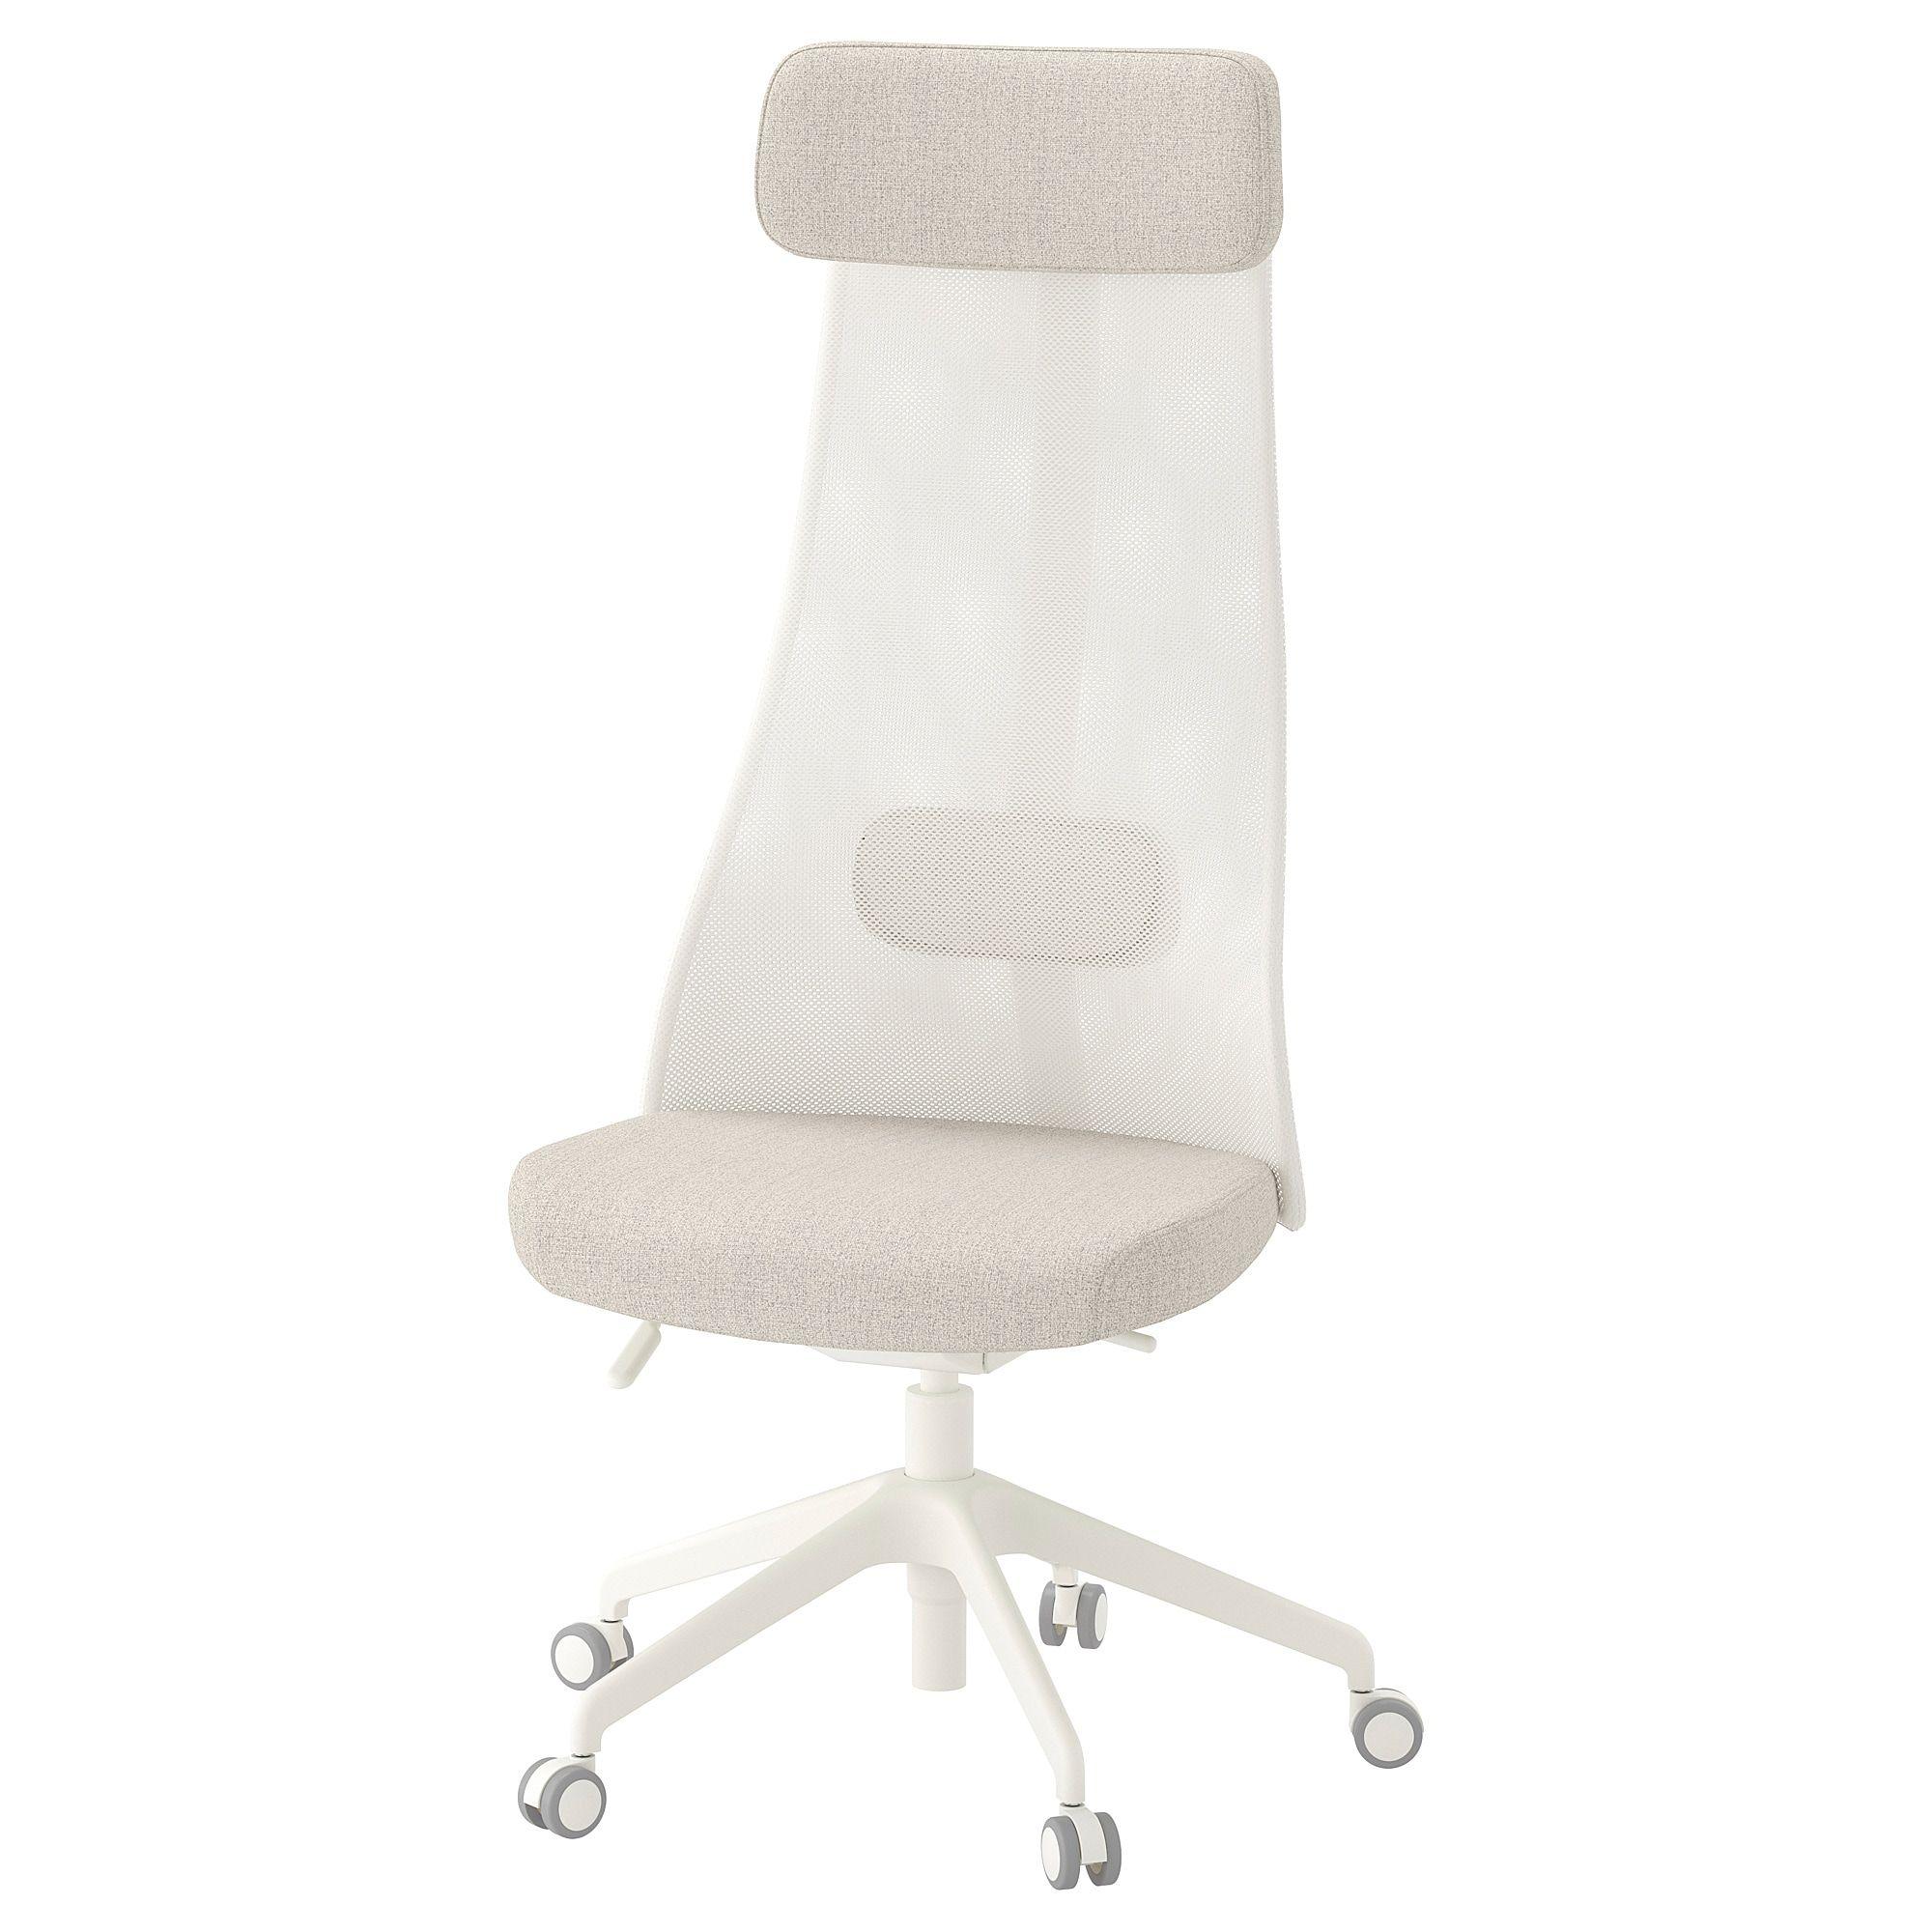 Jarvfjallet Swivel Chair Gunnared Beige Ikea Office Chair